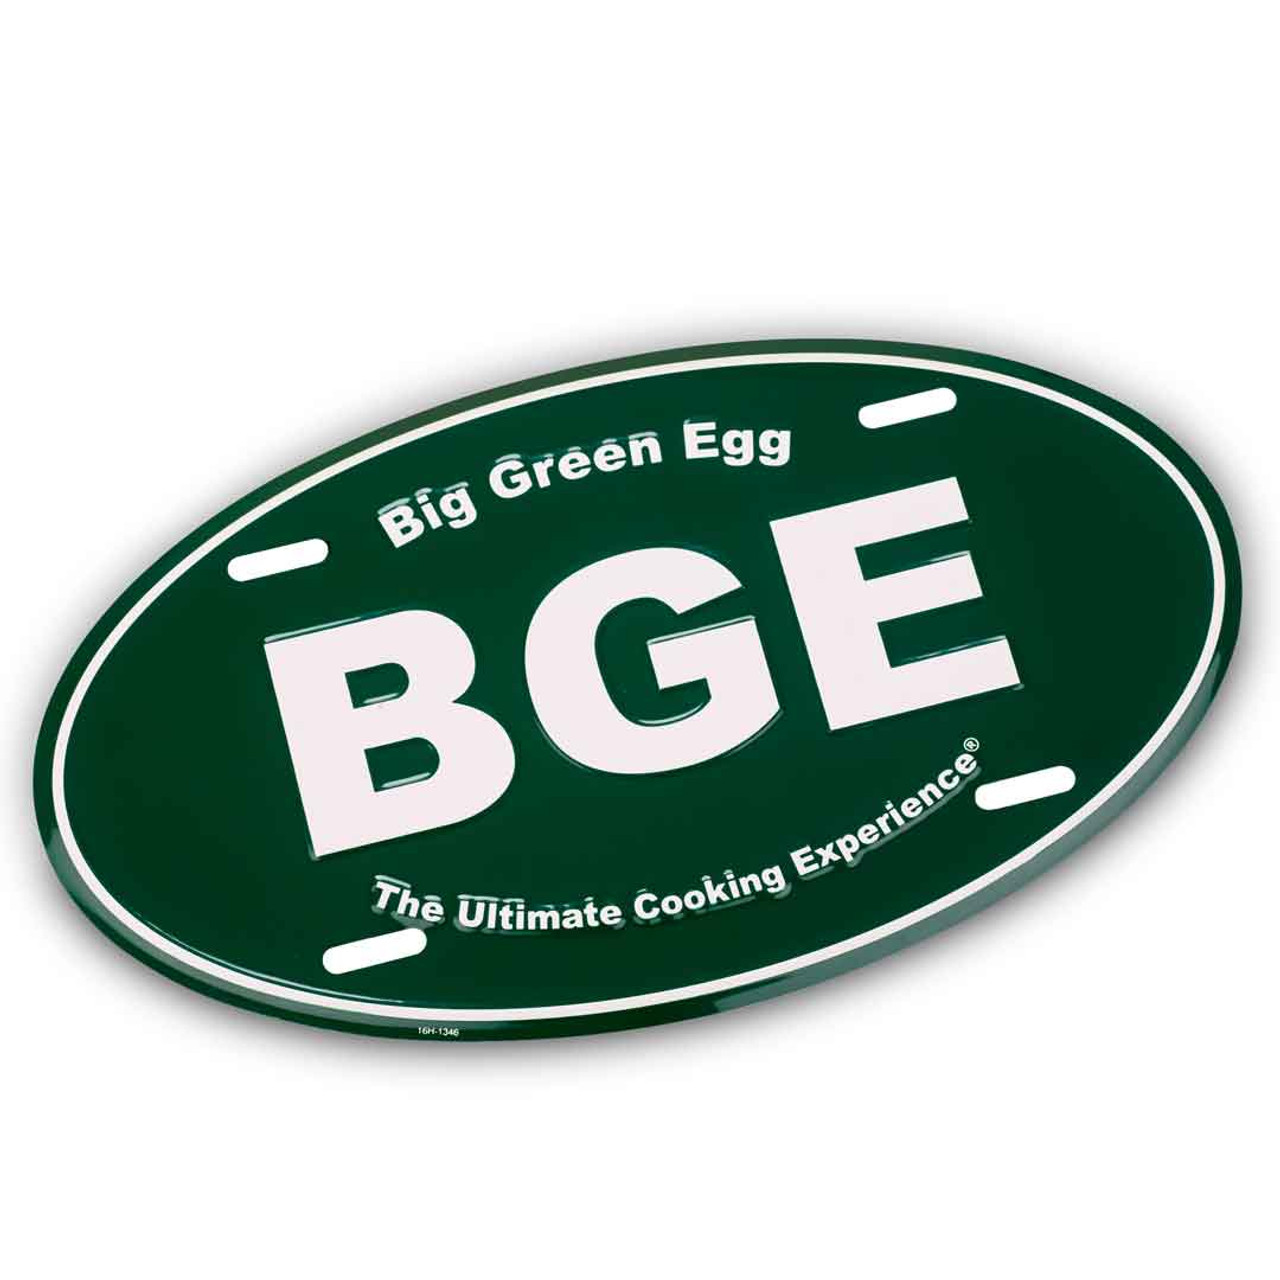 BGE oval sign/front license plate